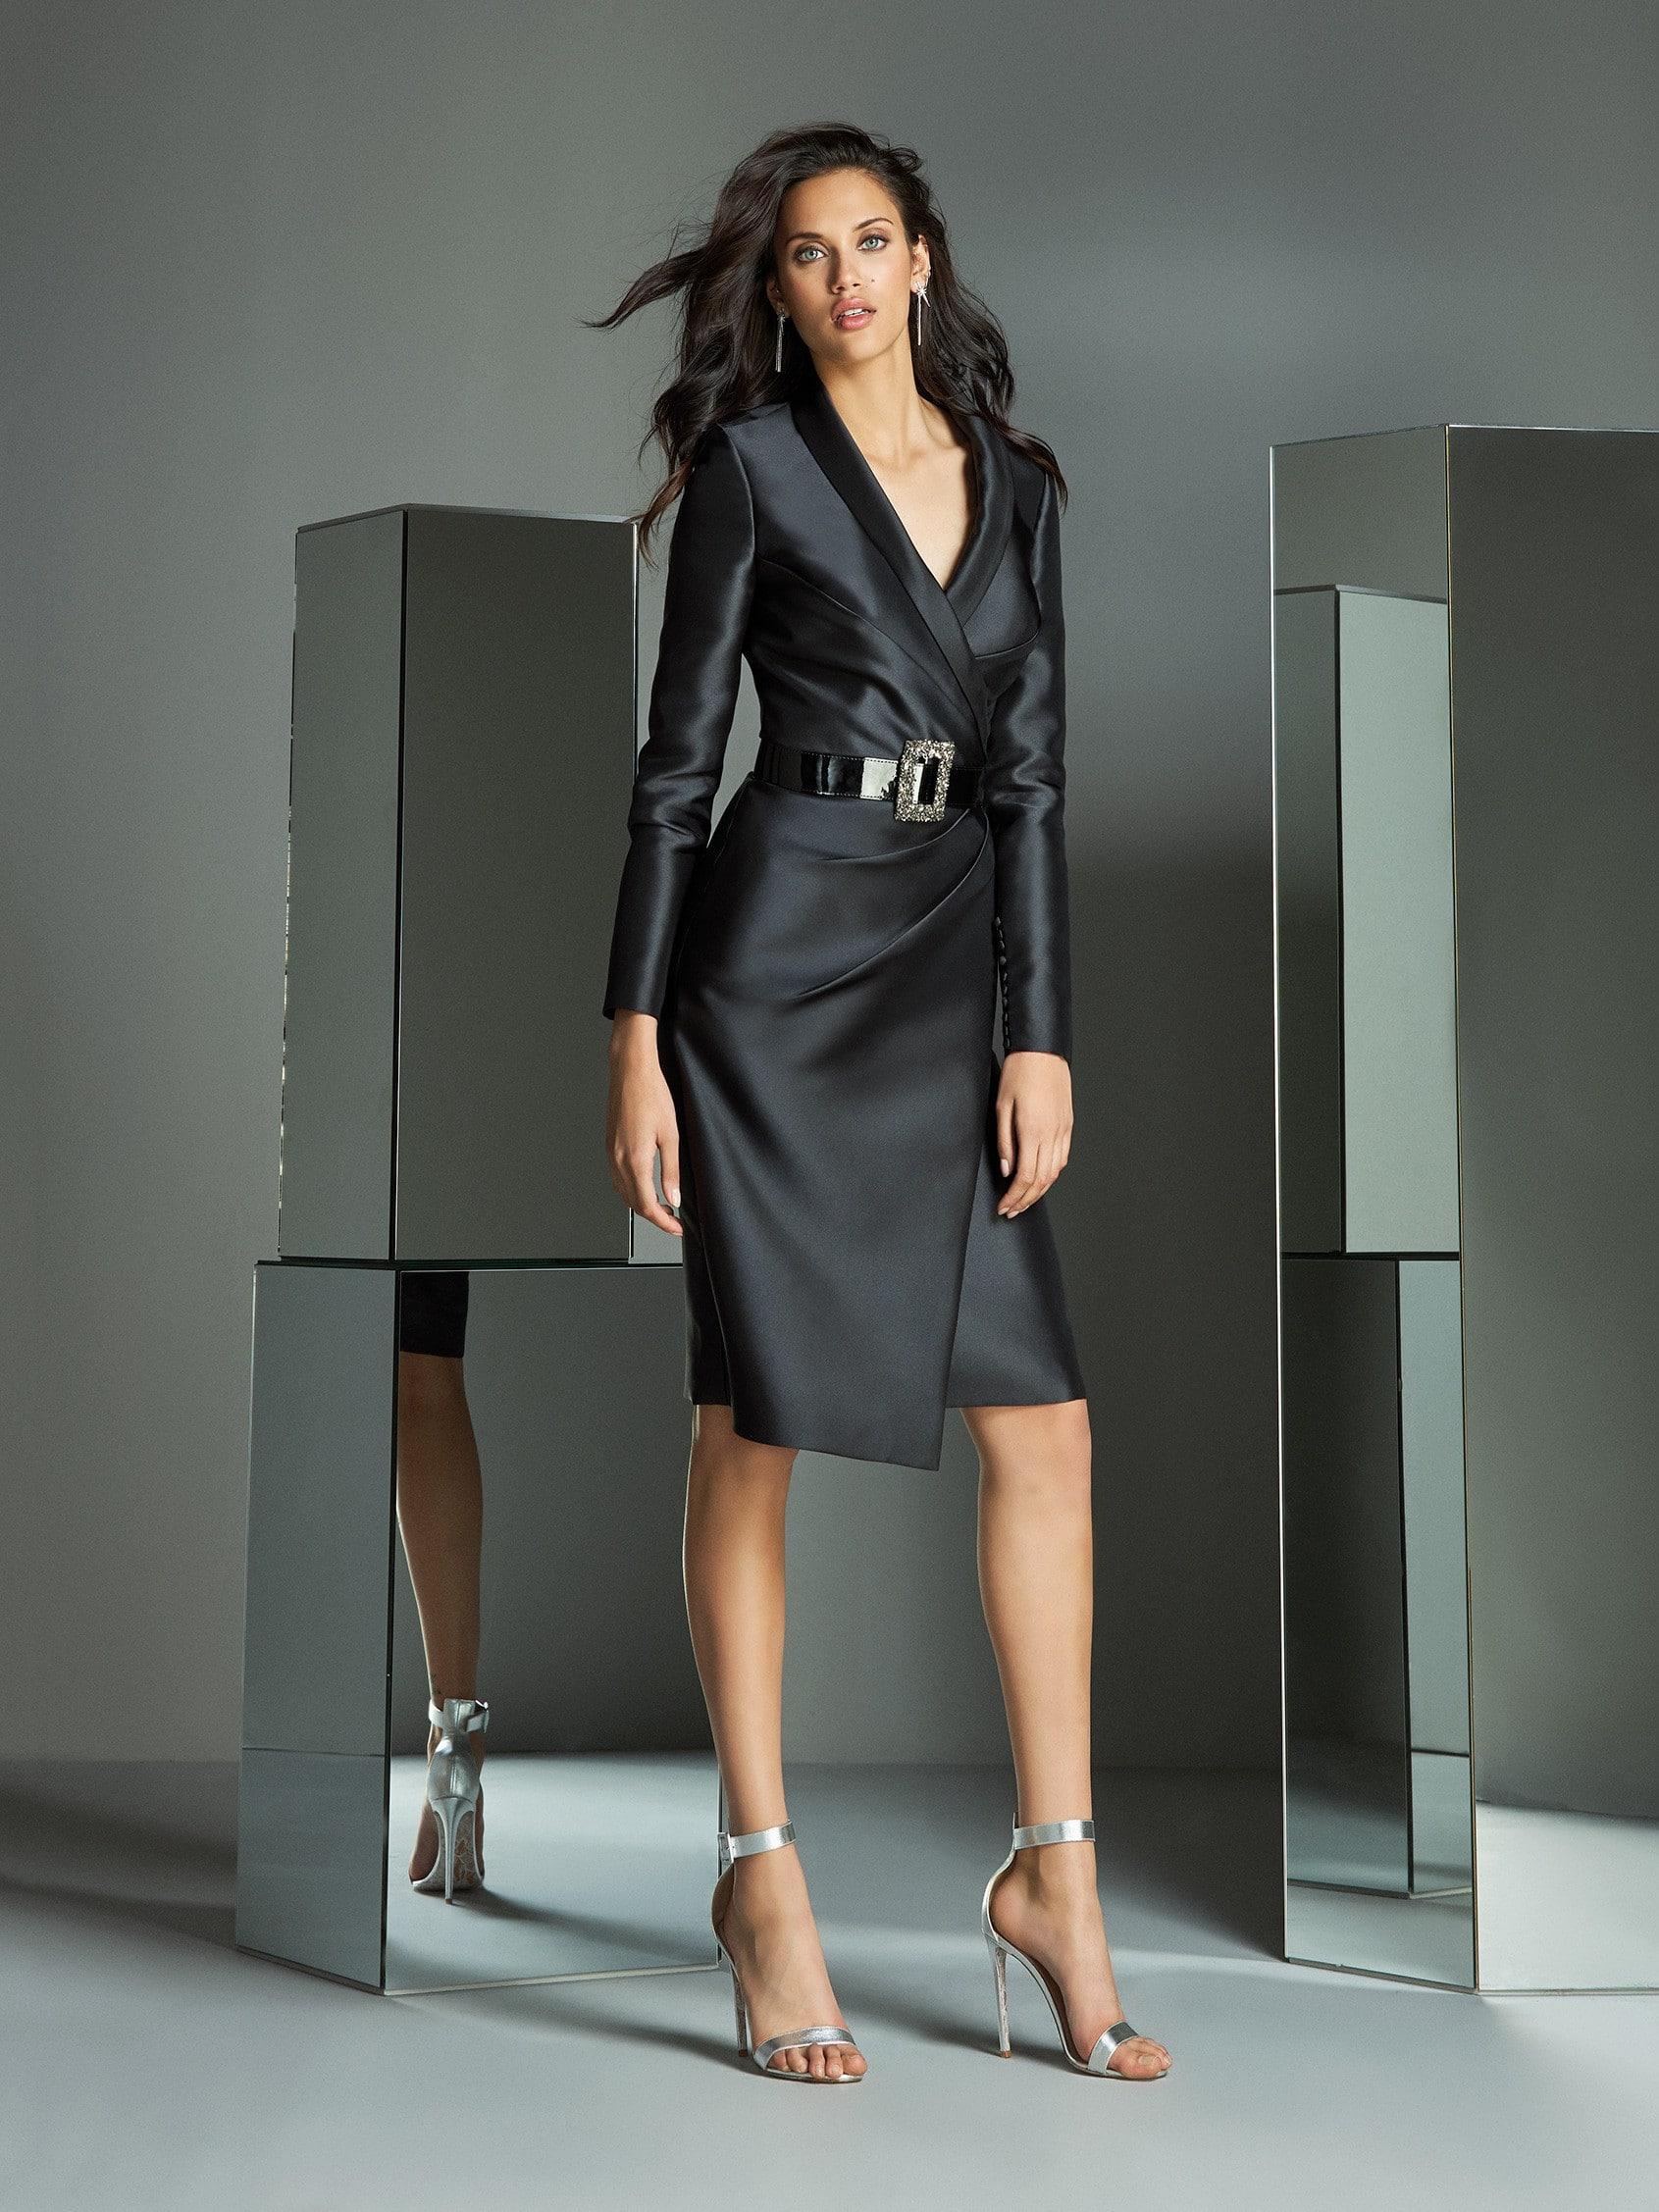 Pronovias TT-style 105 dress